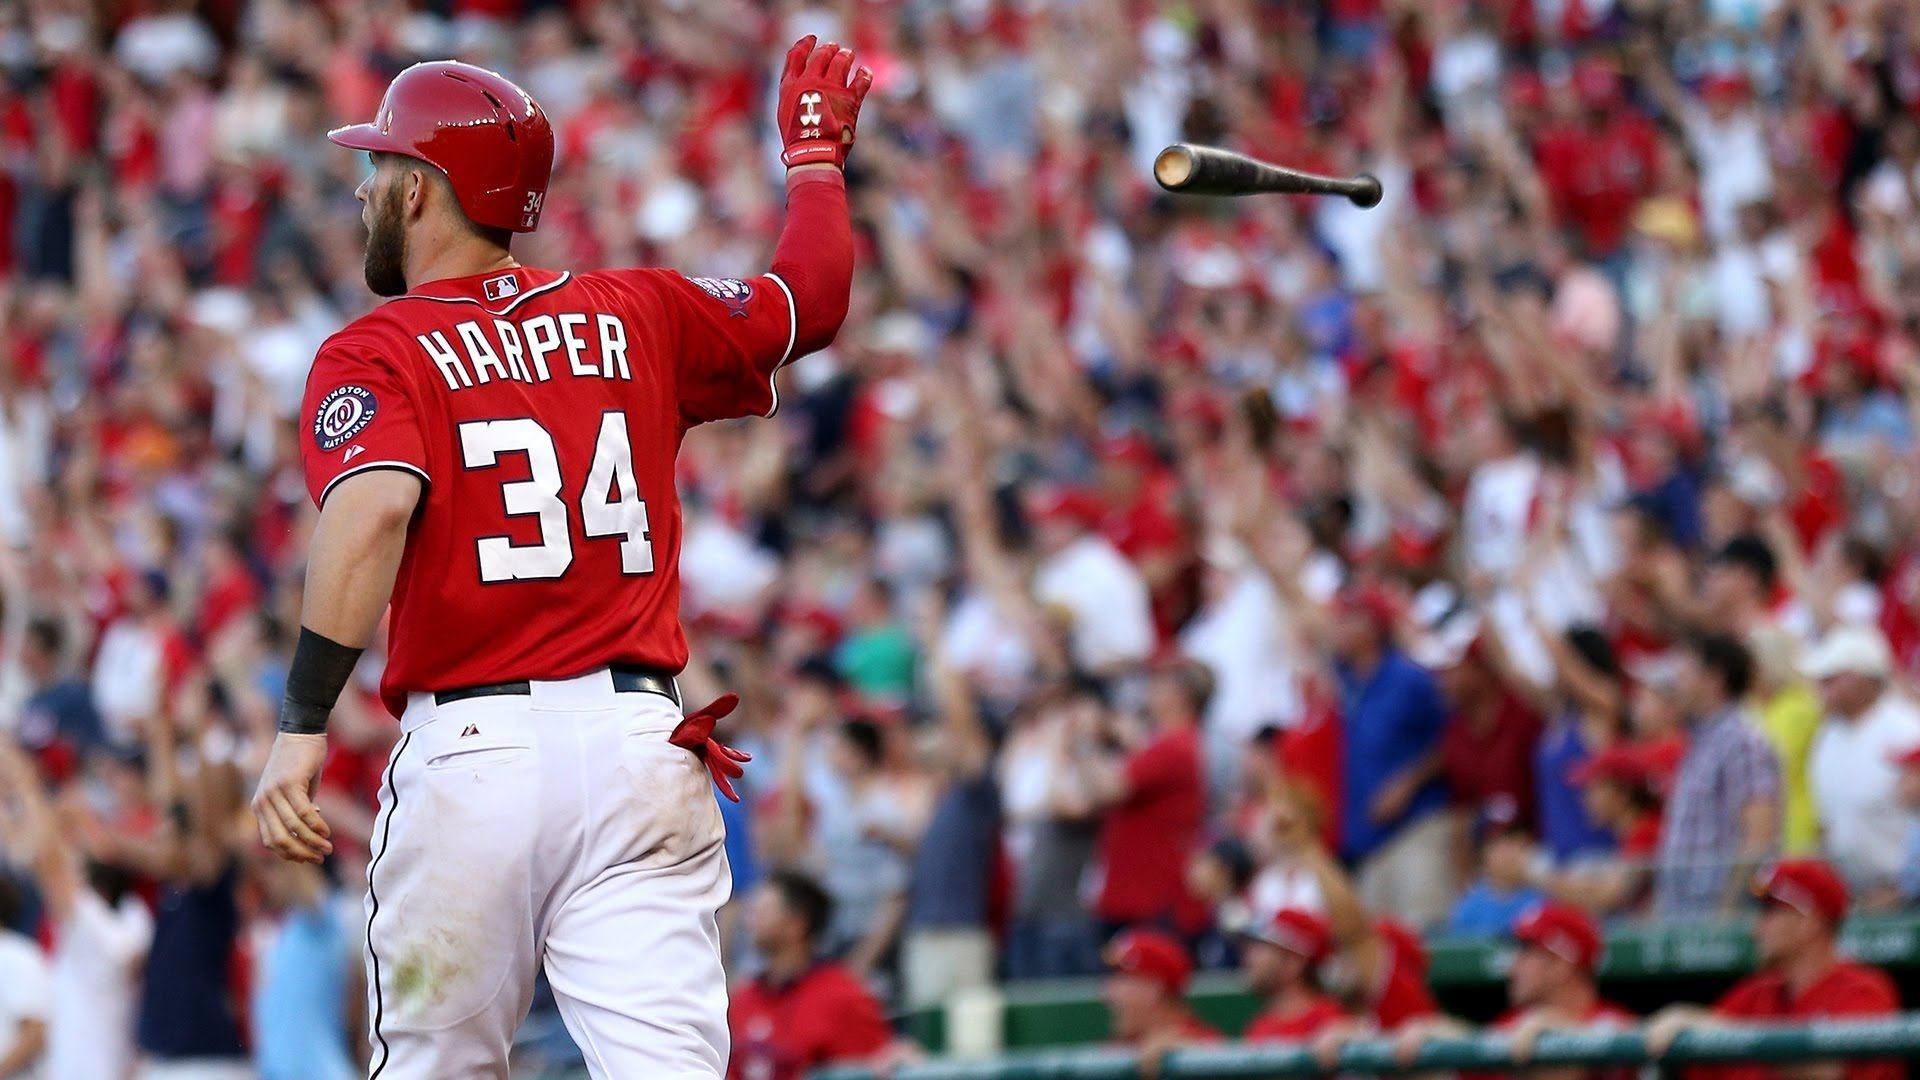 bryce harper baseball wallpaper free download